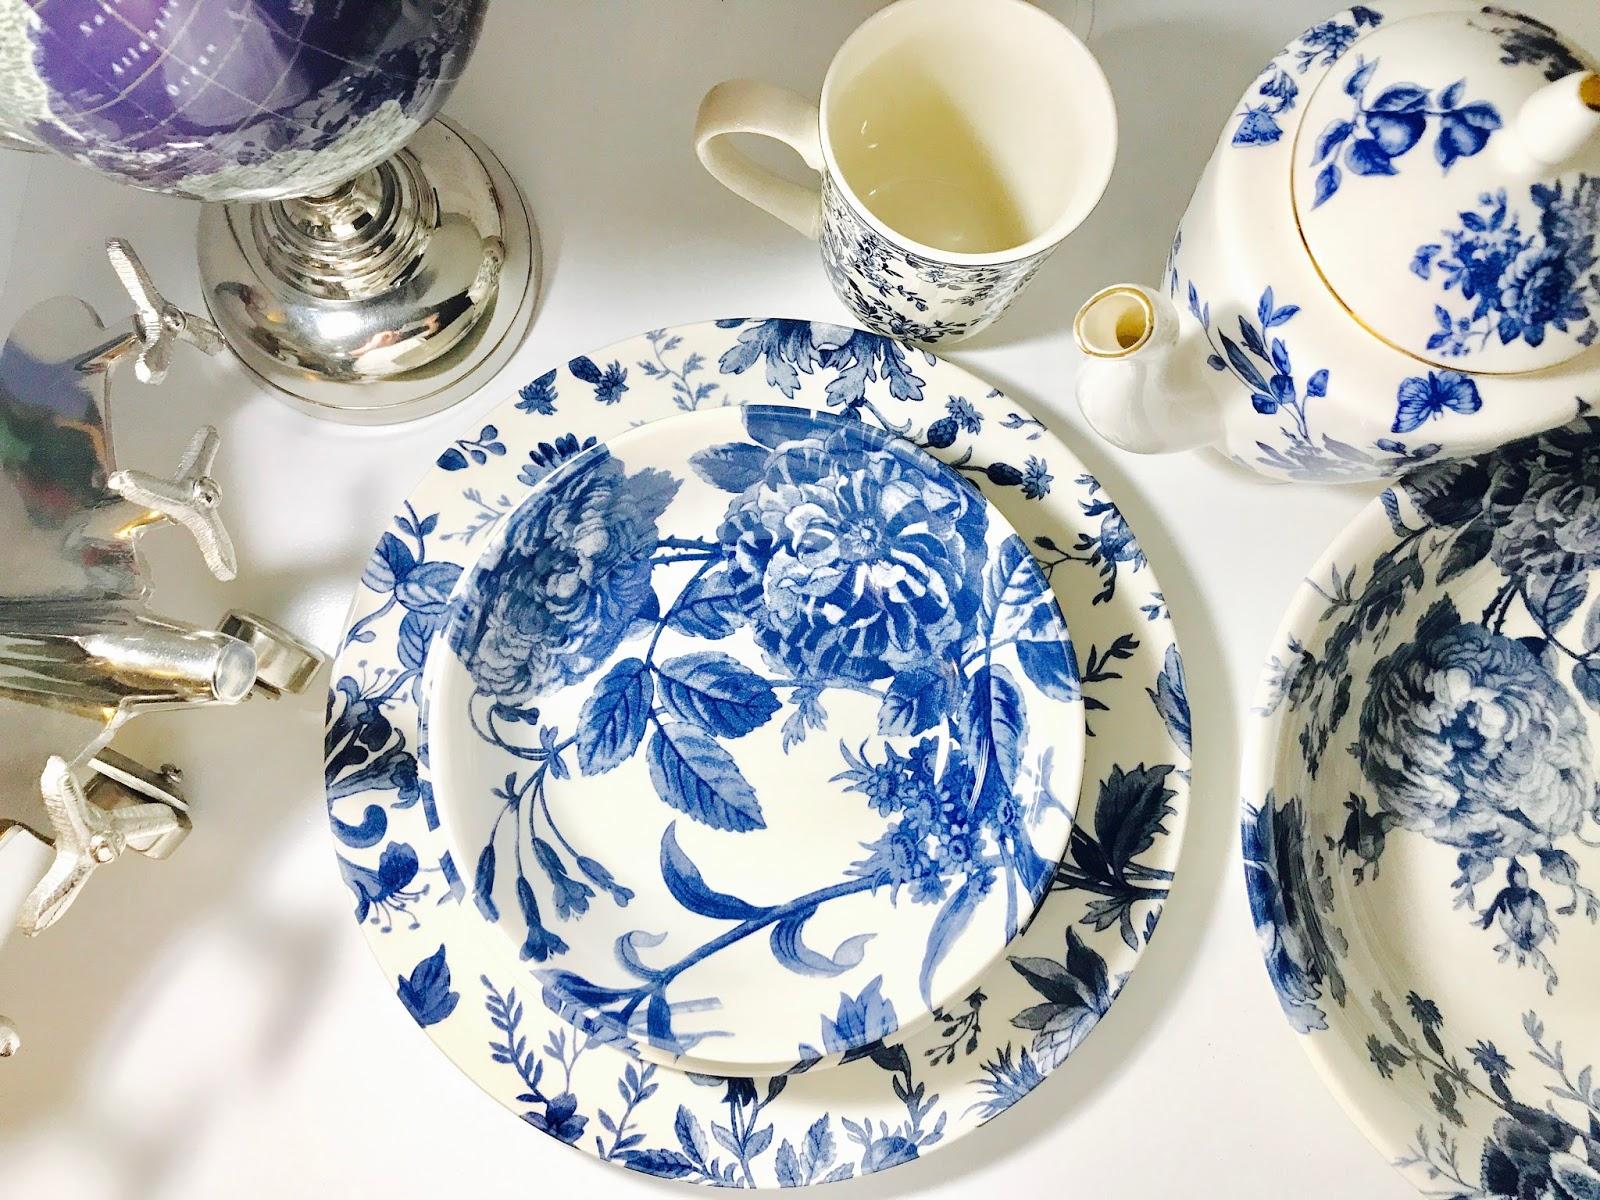 #ChicSassyMomFinds | Royal Stafford Dinnerware etc. & ChicSassyMomFinds | Royal Stafford Dinnerware etc.